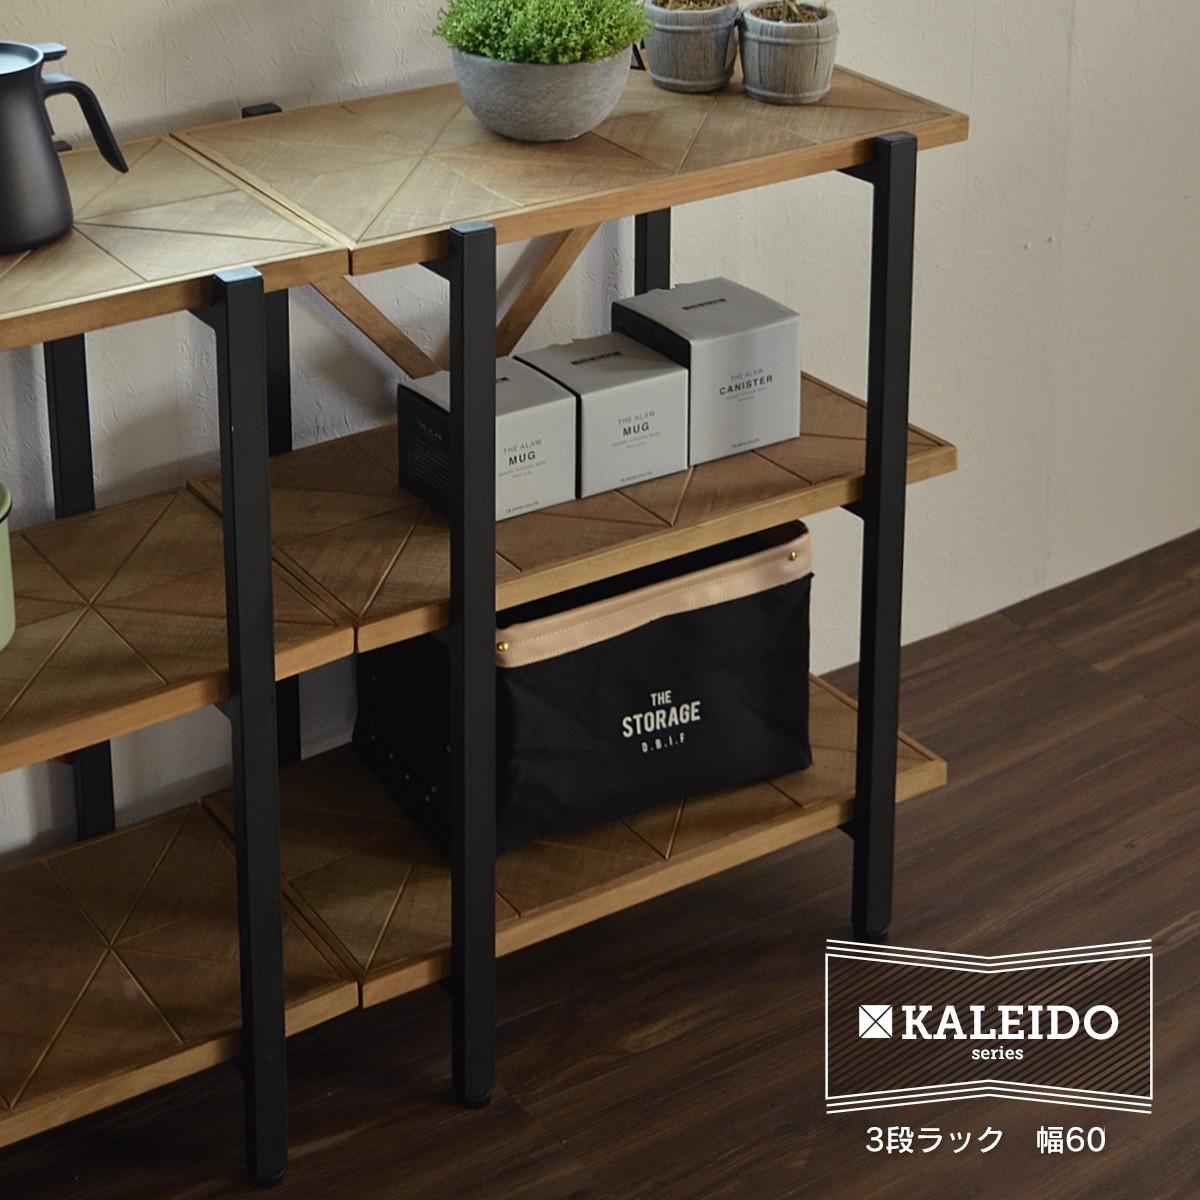 KALEIDO カレイド 3段ラック 幅60 オープン 収納 木製 棚 本棚 シェルフ 間仕切り ディスプレイ コンパクト スリム 省スペース 一人暮らし リビング おしゃれ デザイン